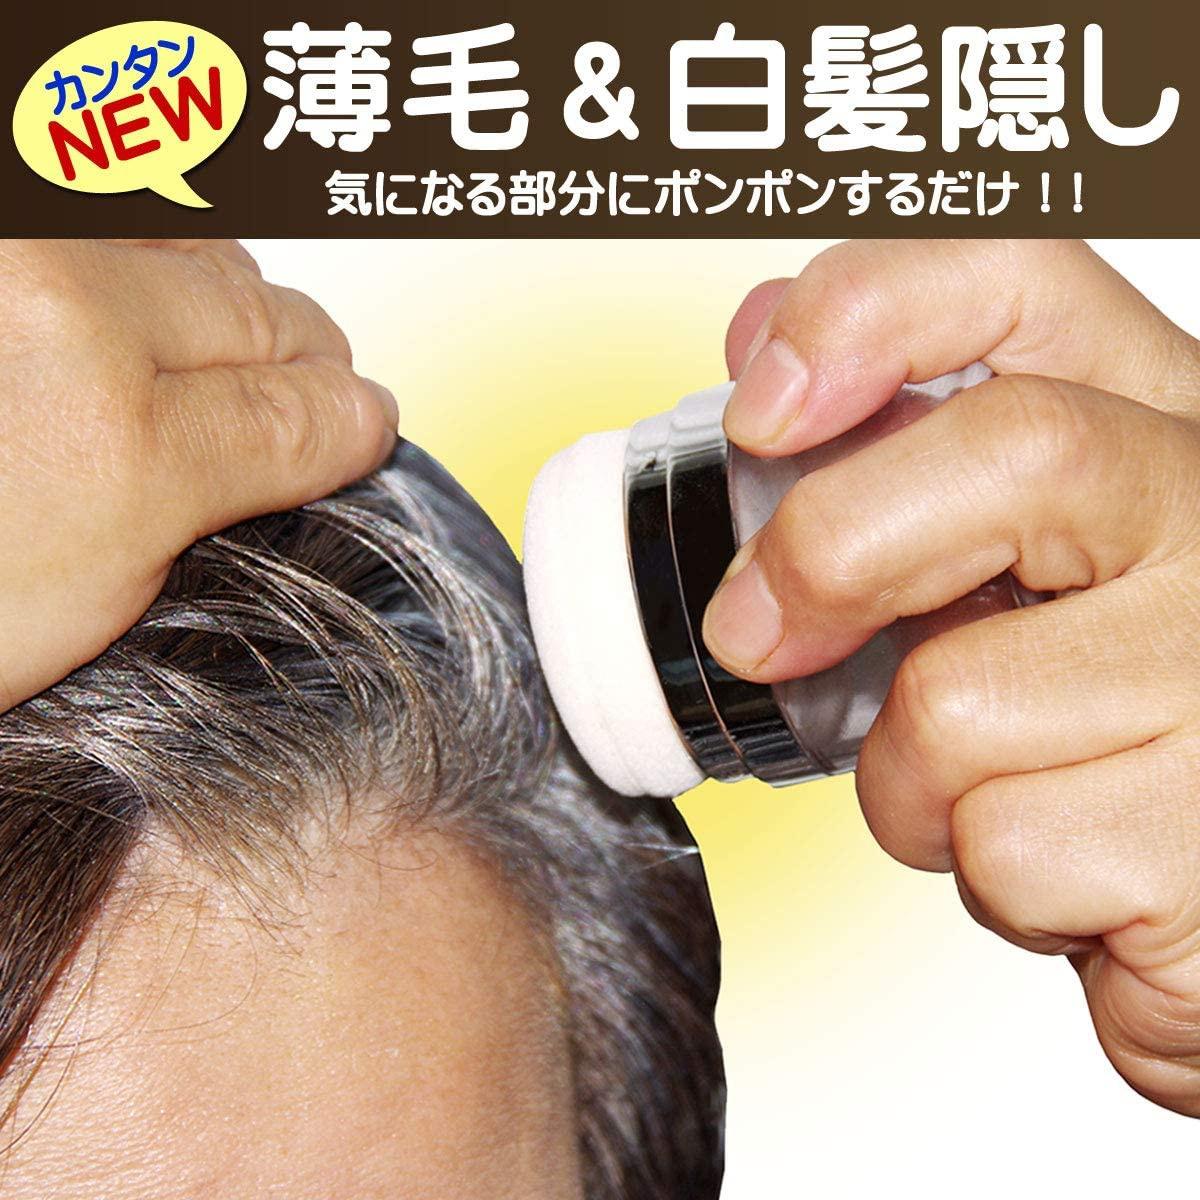 Alleygem(アリージェム) CONCIERGE 頭皮ファンデーションの商品画像2